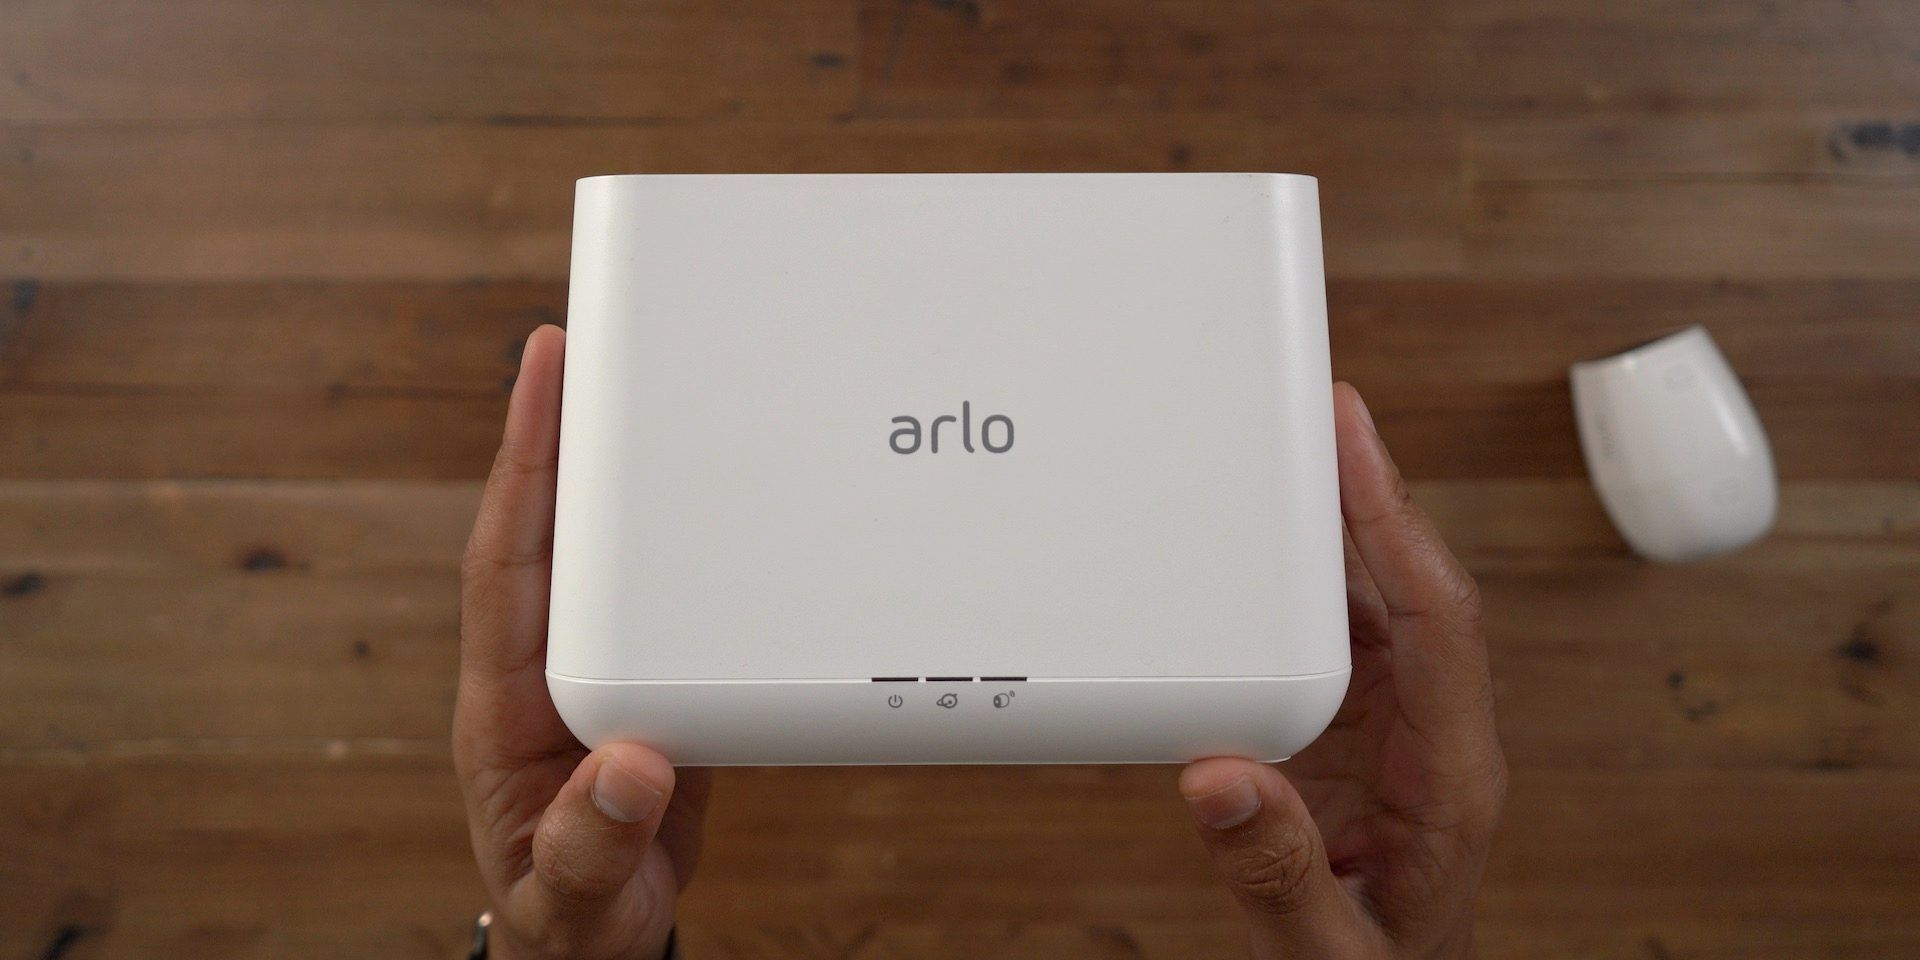 Arlo launches new app for smart cameras, doorbells, and